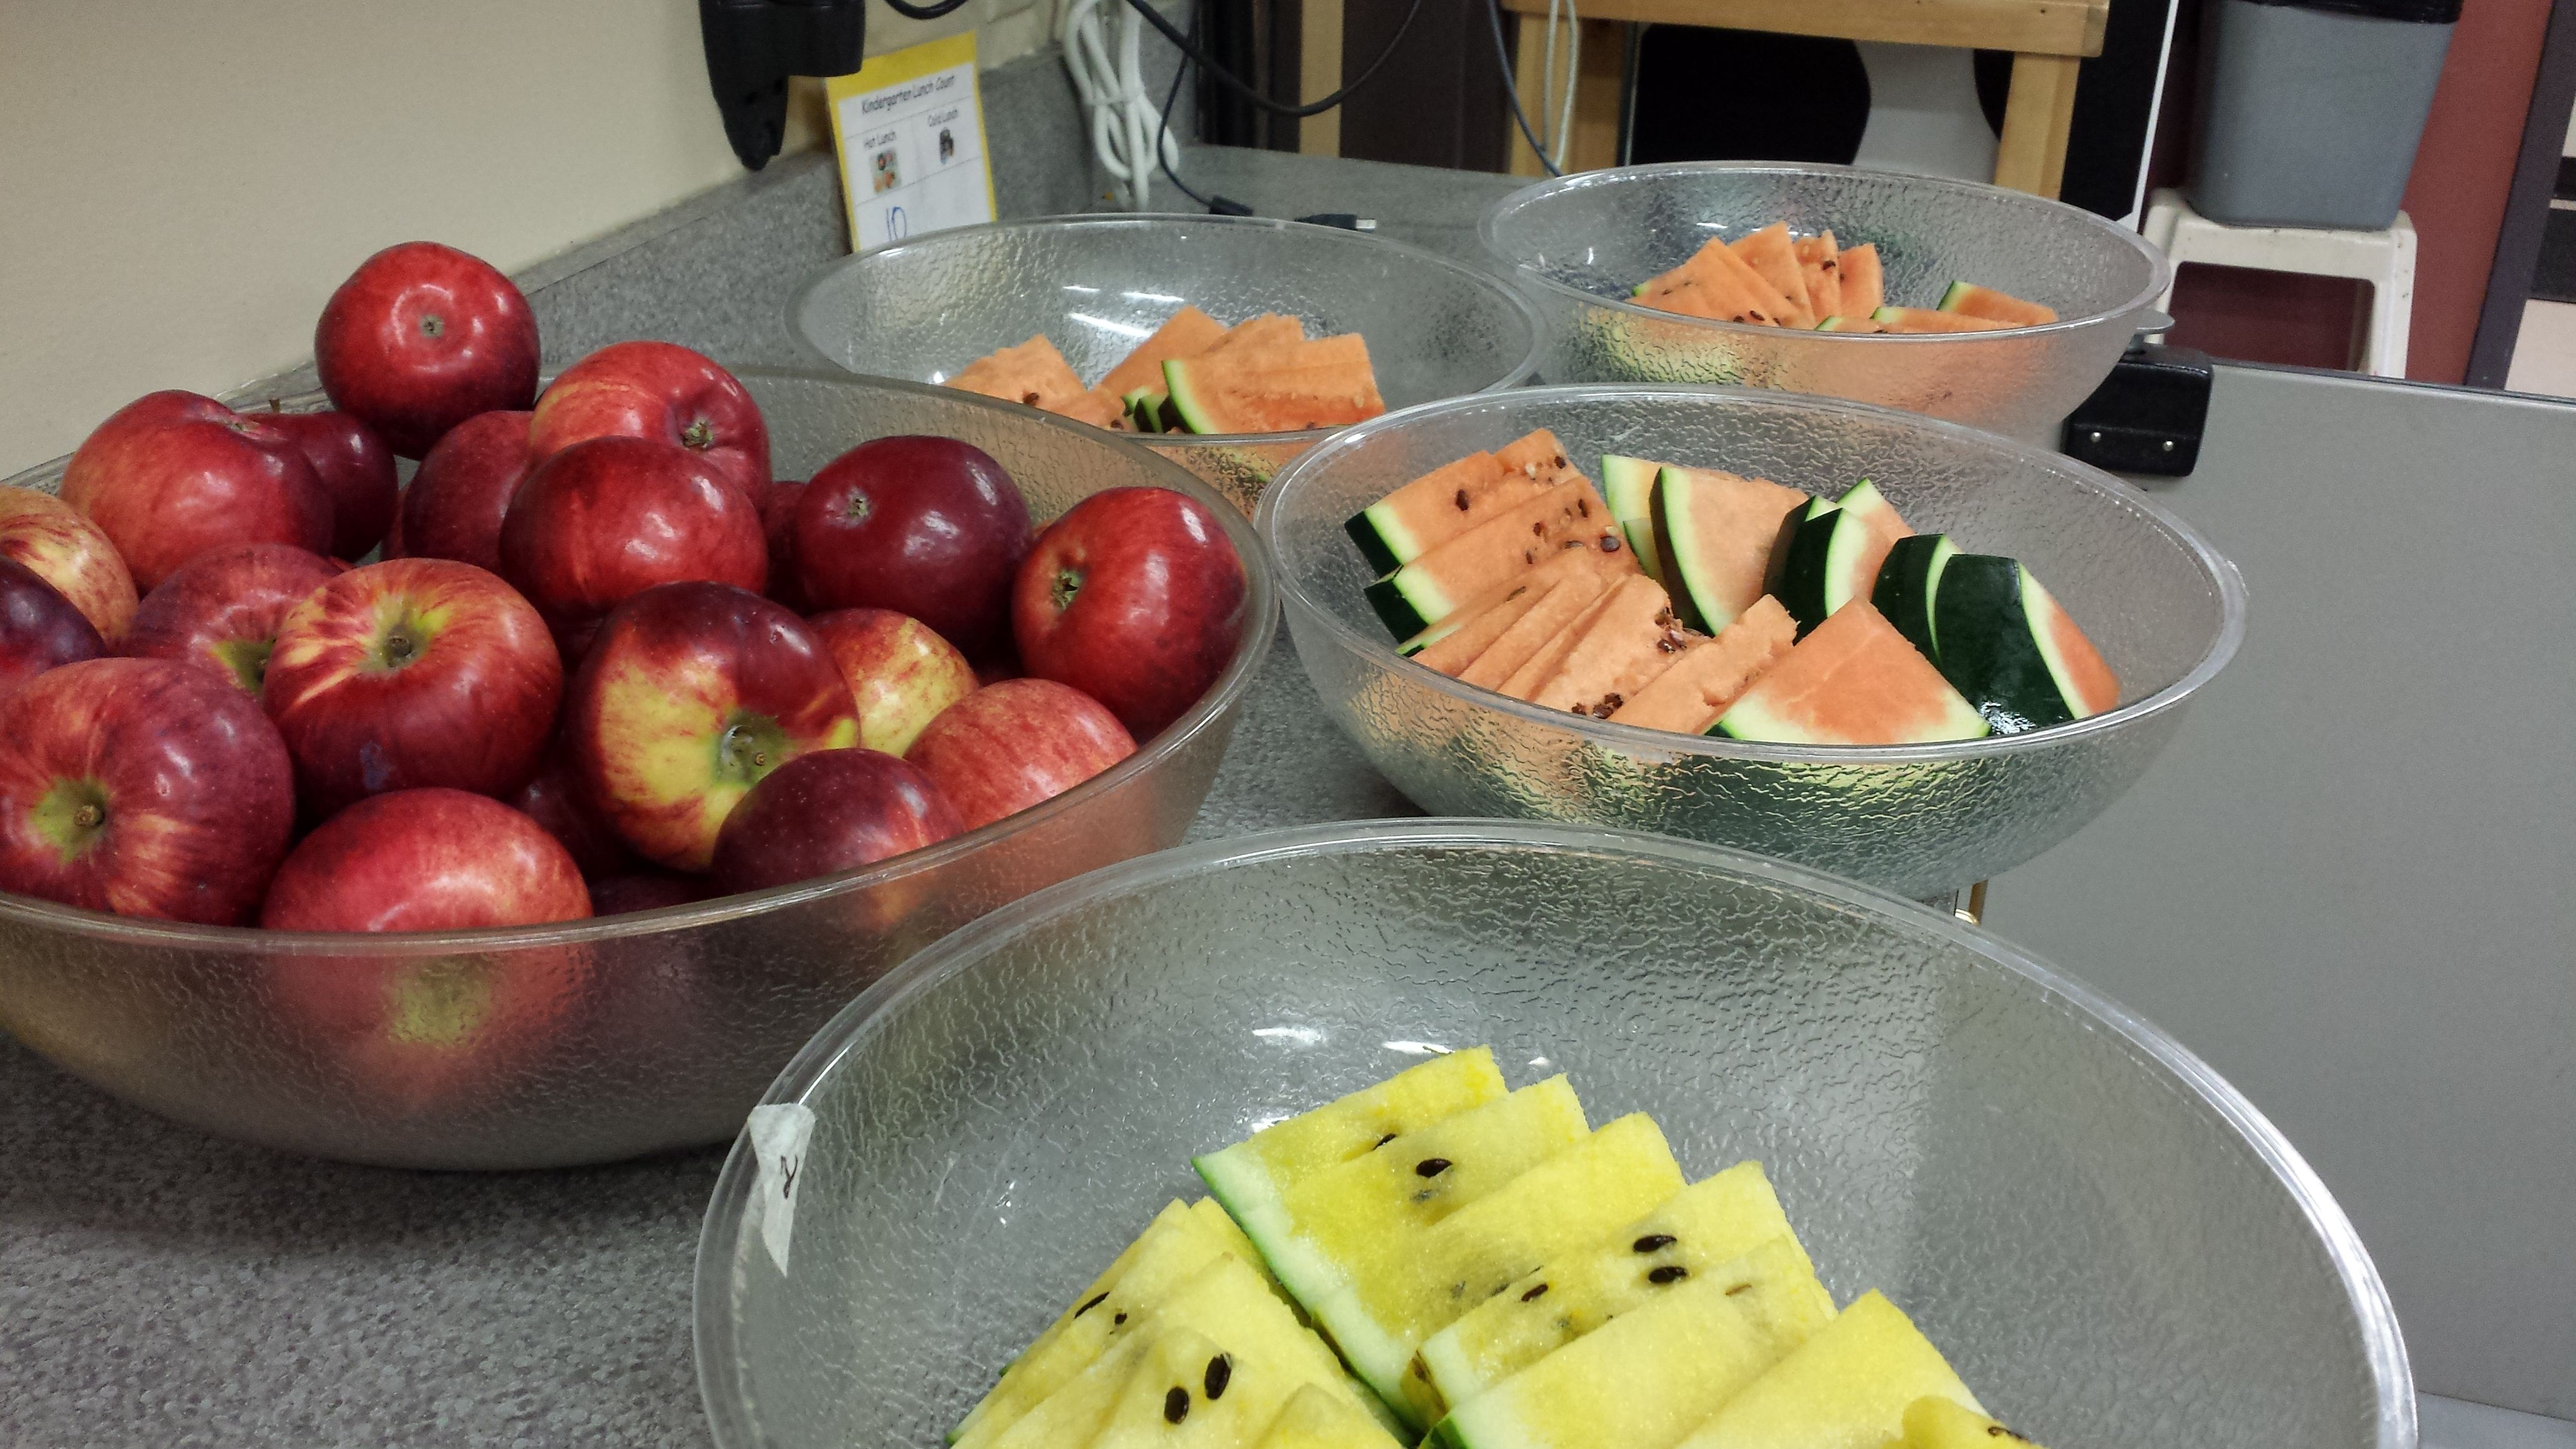 Fall Fresh Fruit and Veggies